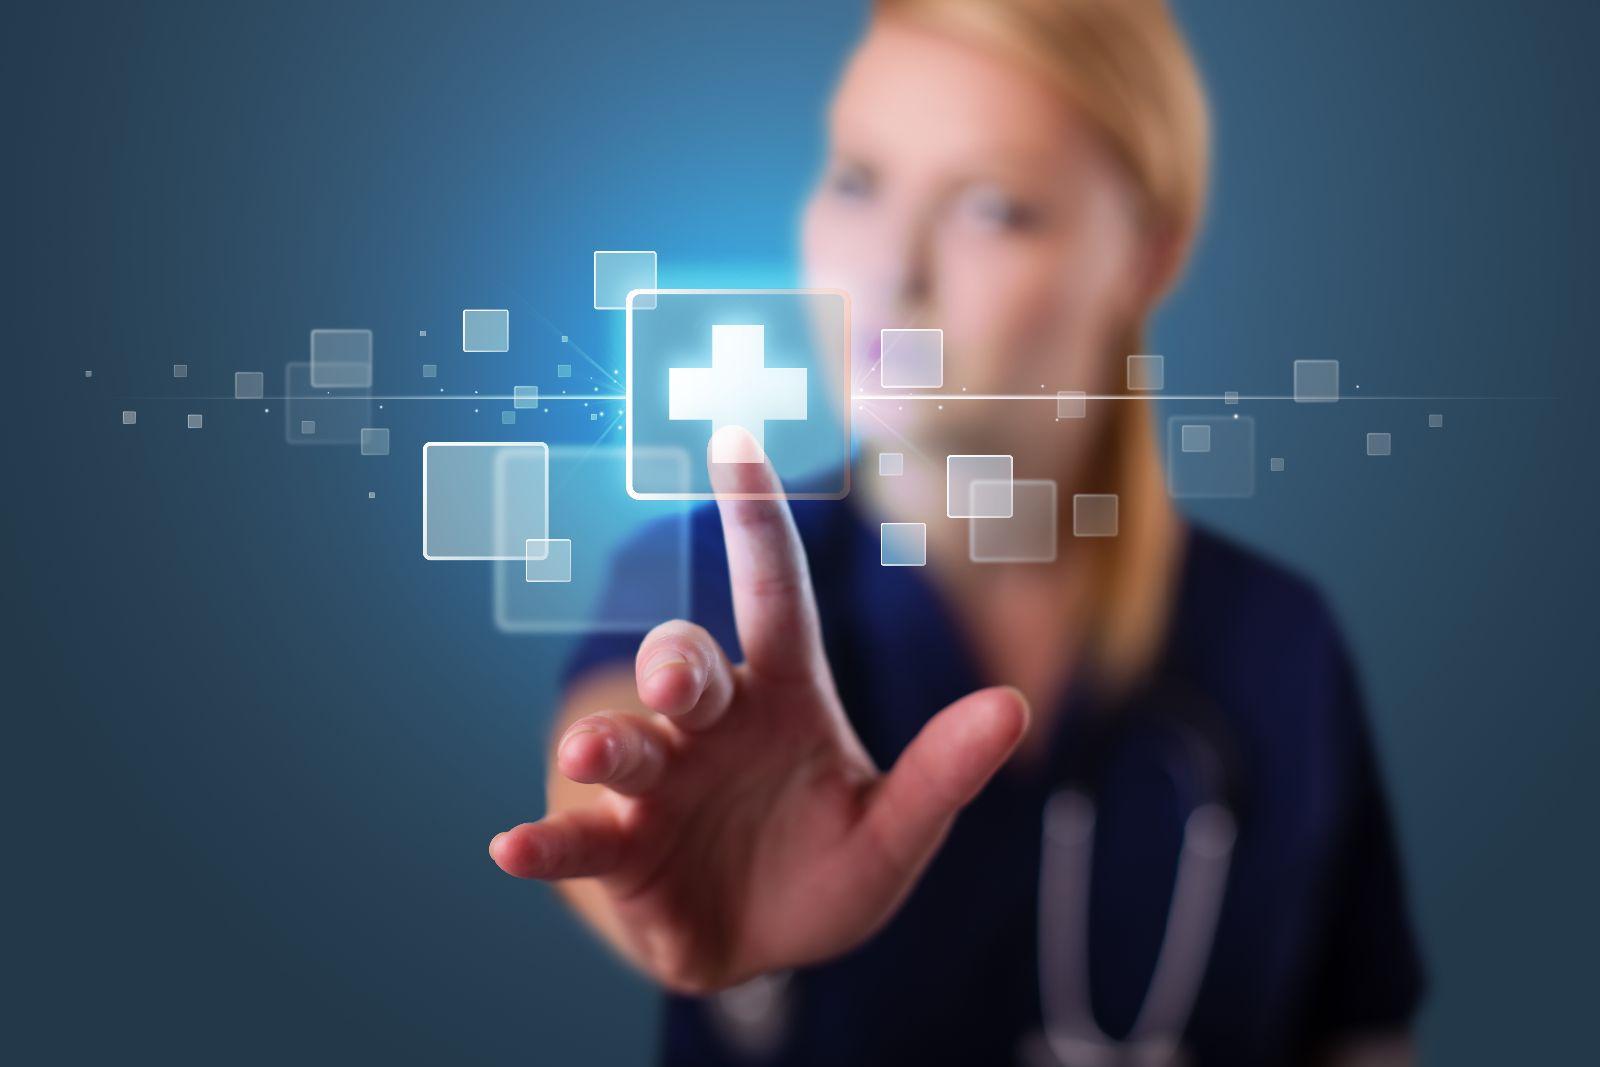 Enfermera tocando pantalla virtual en dond se encuentra icono de hospital